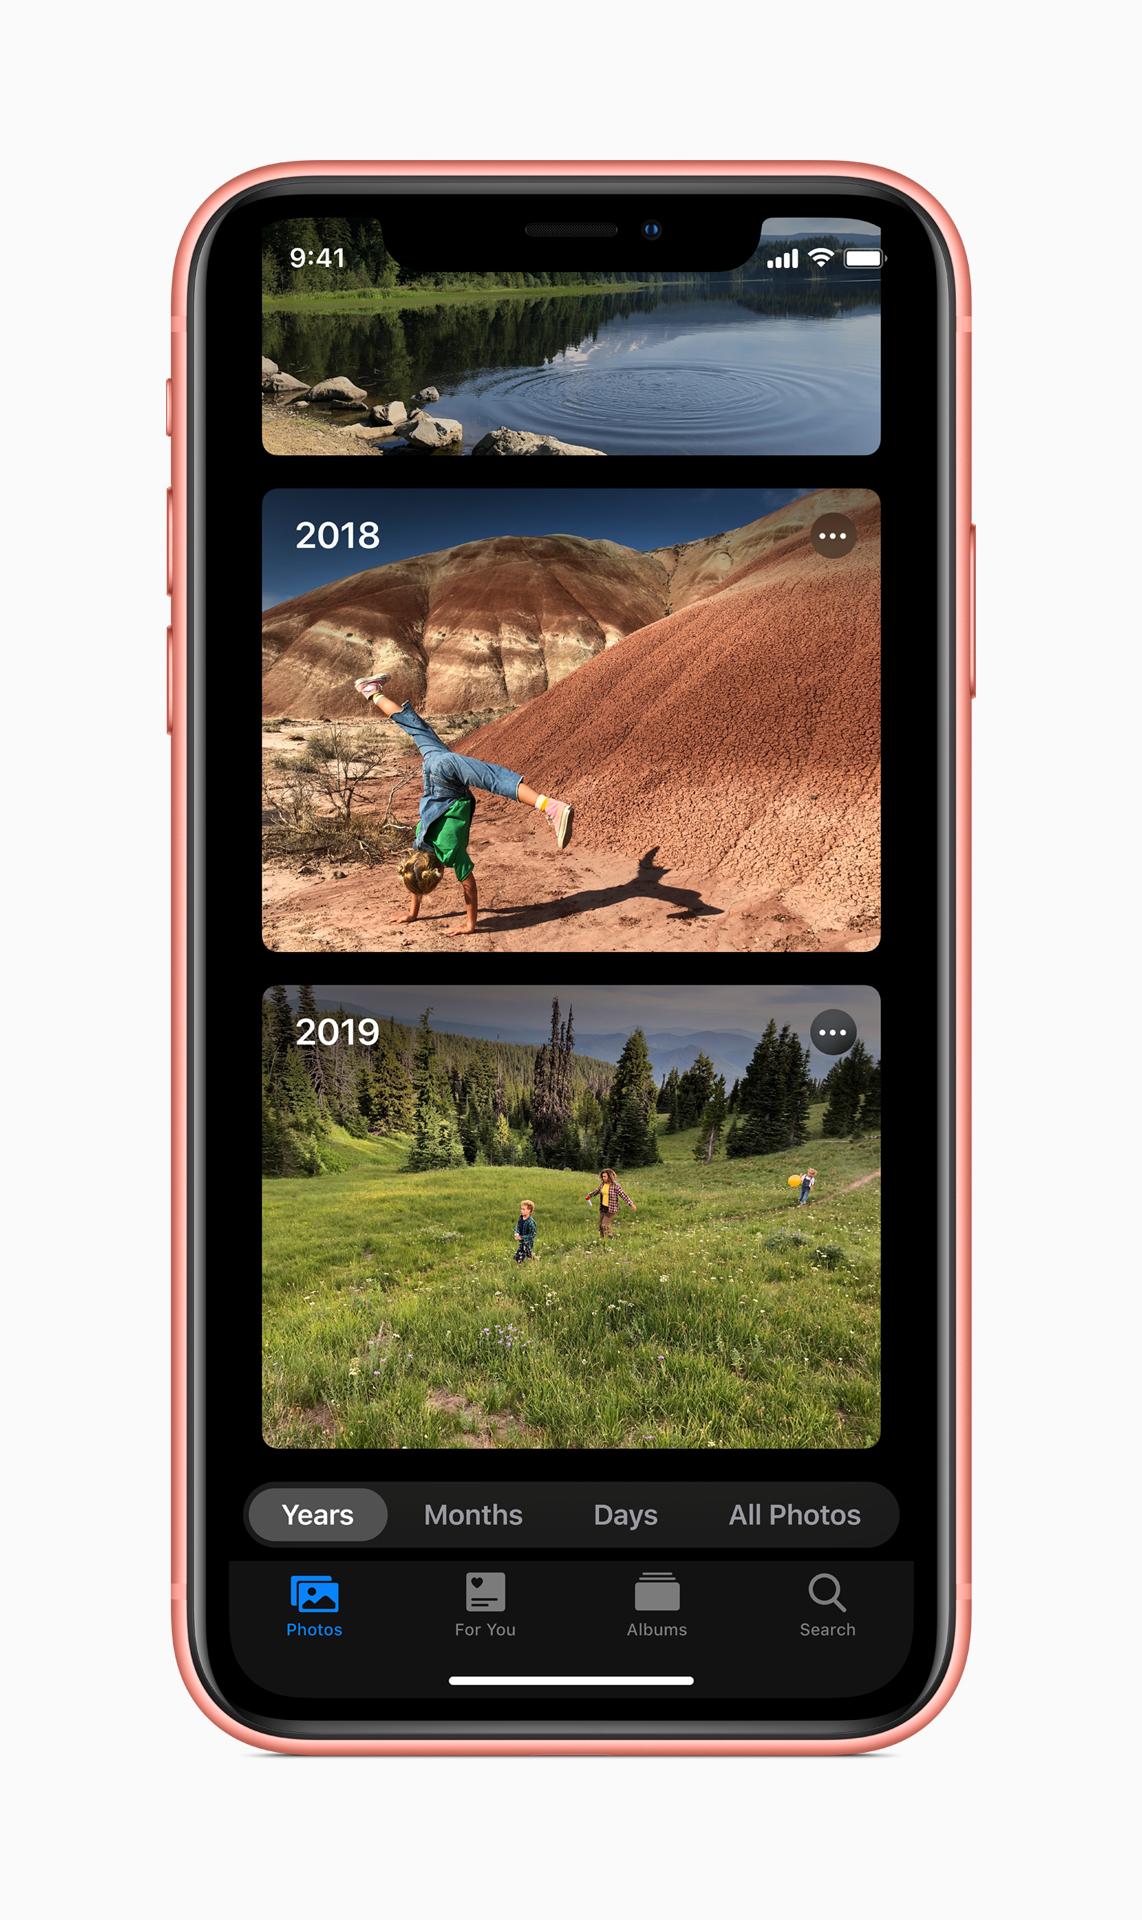 8 Apple-ios-13-photos-screen-iphone-xs-06032019